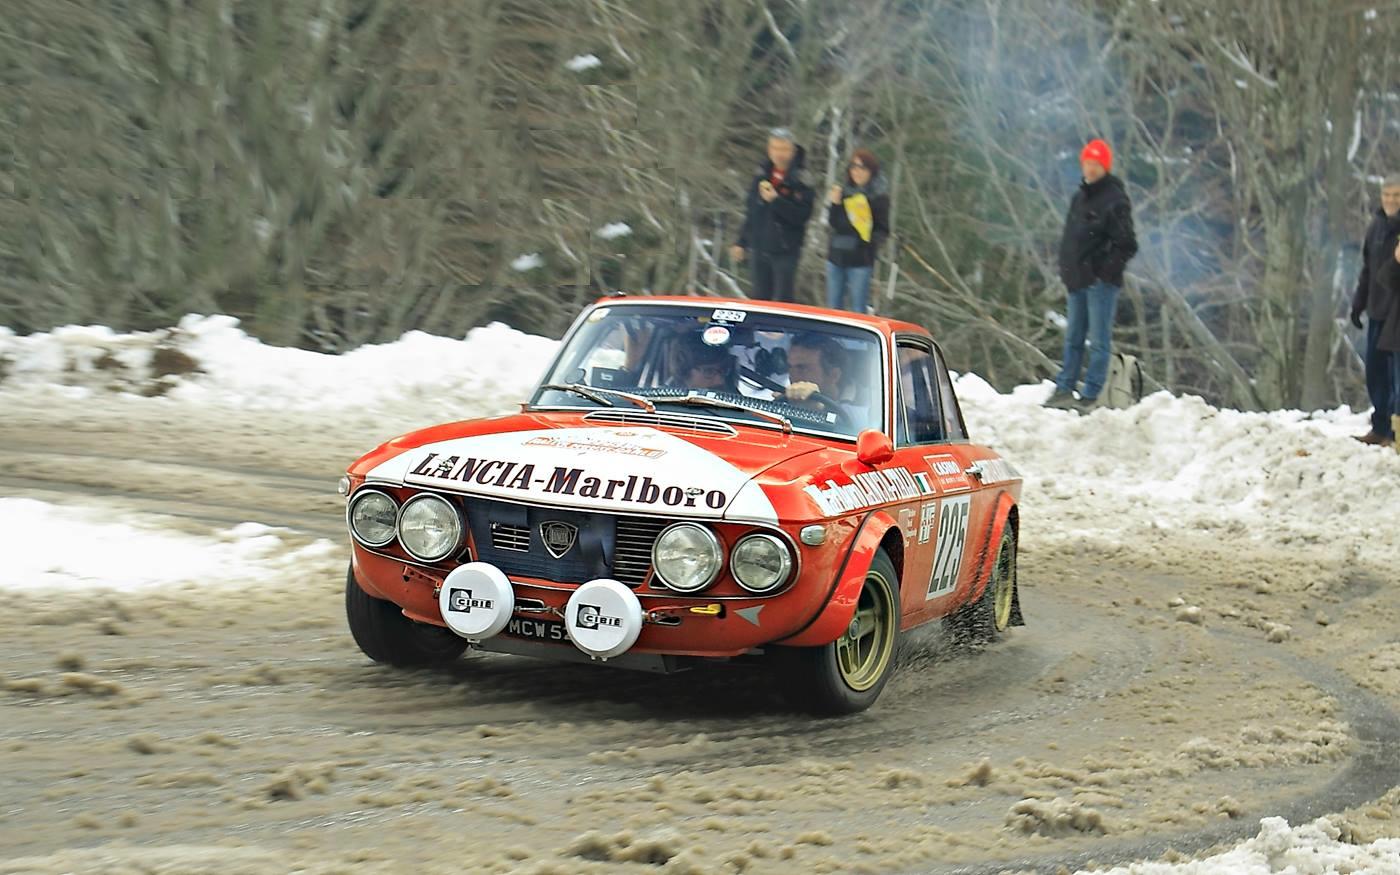 Montecarlo Storico 2014, D. Perfetti -  R. Kessel su Lancia Fulvia 1.6 HF Gr.4